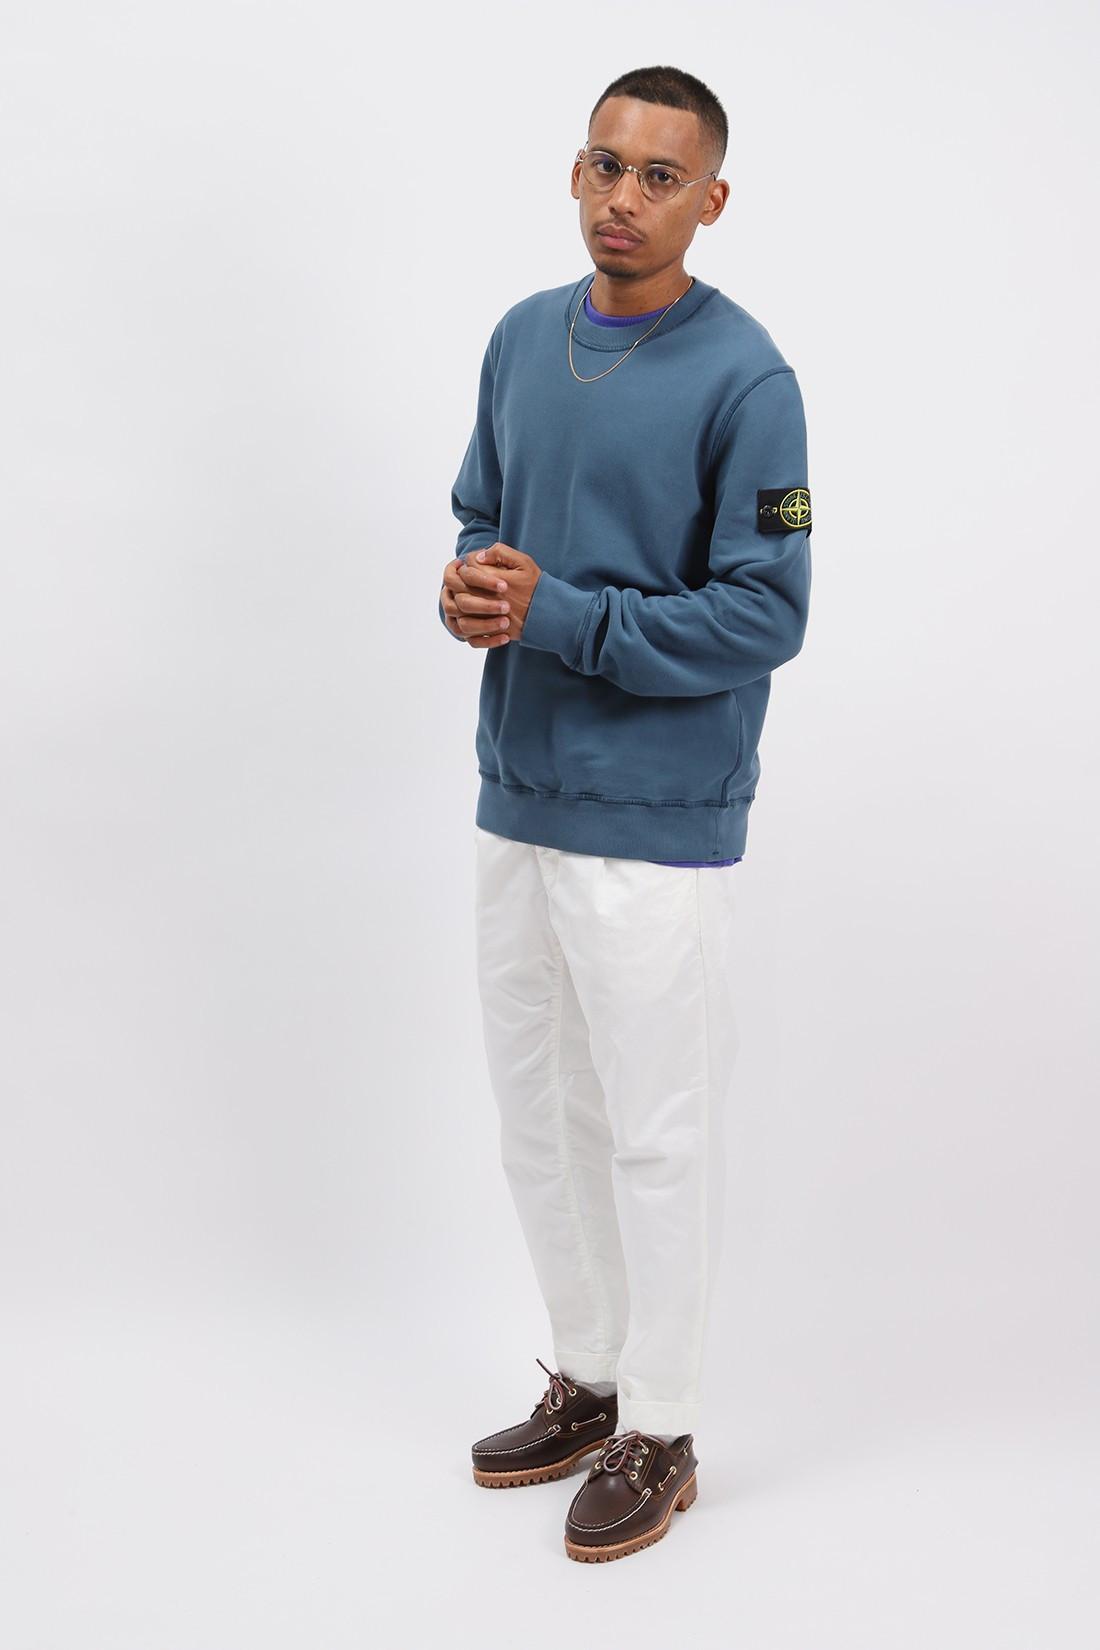 STONE ISLAND / 63020 crewneck sweater v0023 Ottanio